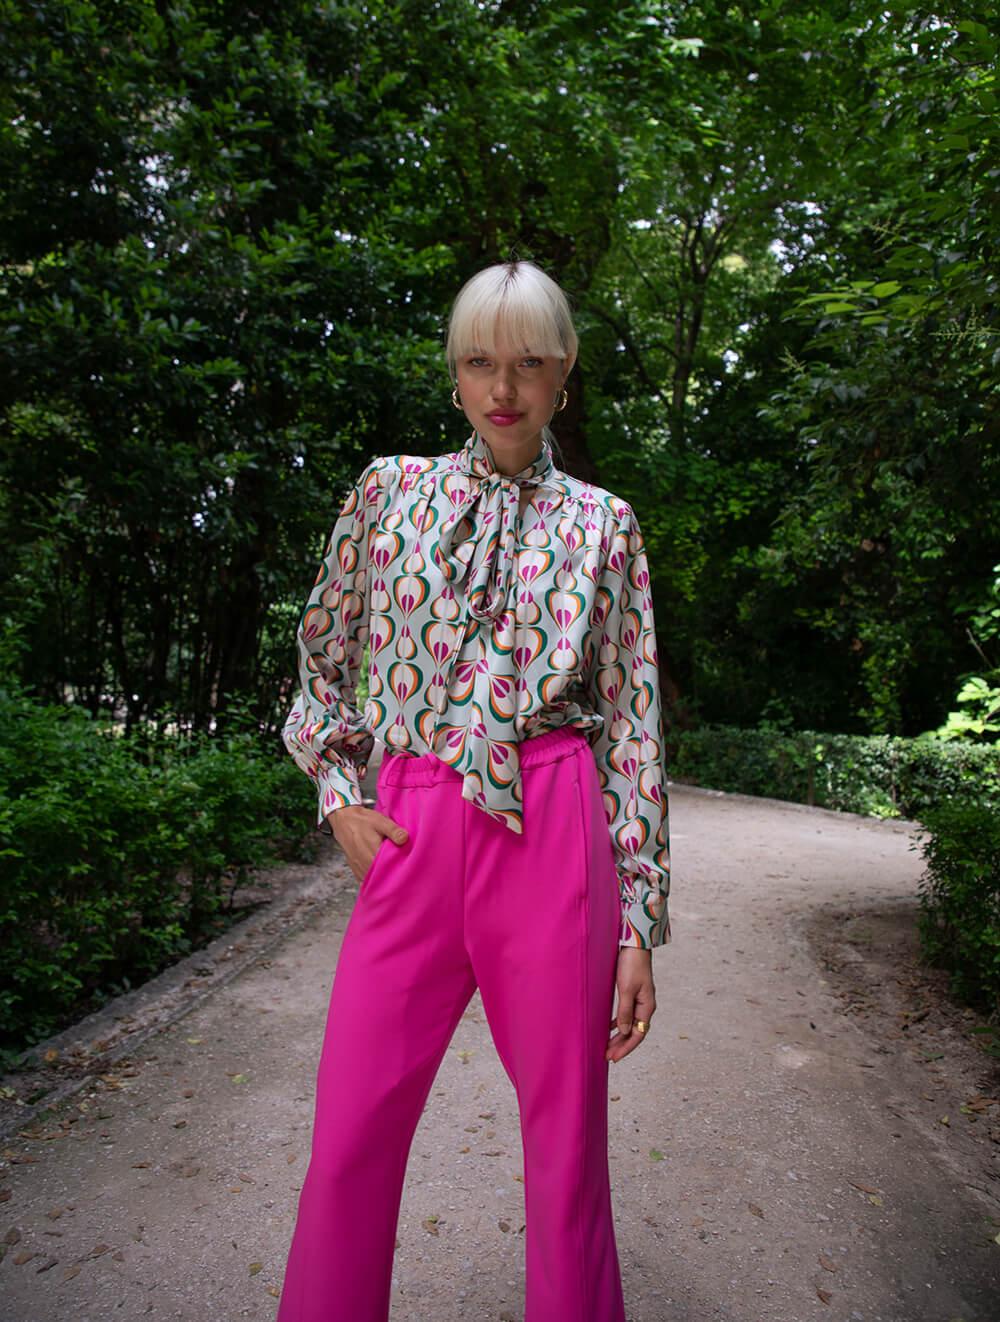 NEVER ON SUNDAY||Η νέα εταιρεία γυναικείων ρούχων 70s Style||Γυναικεία ρούχα